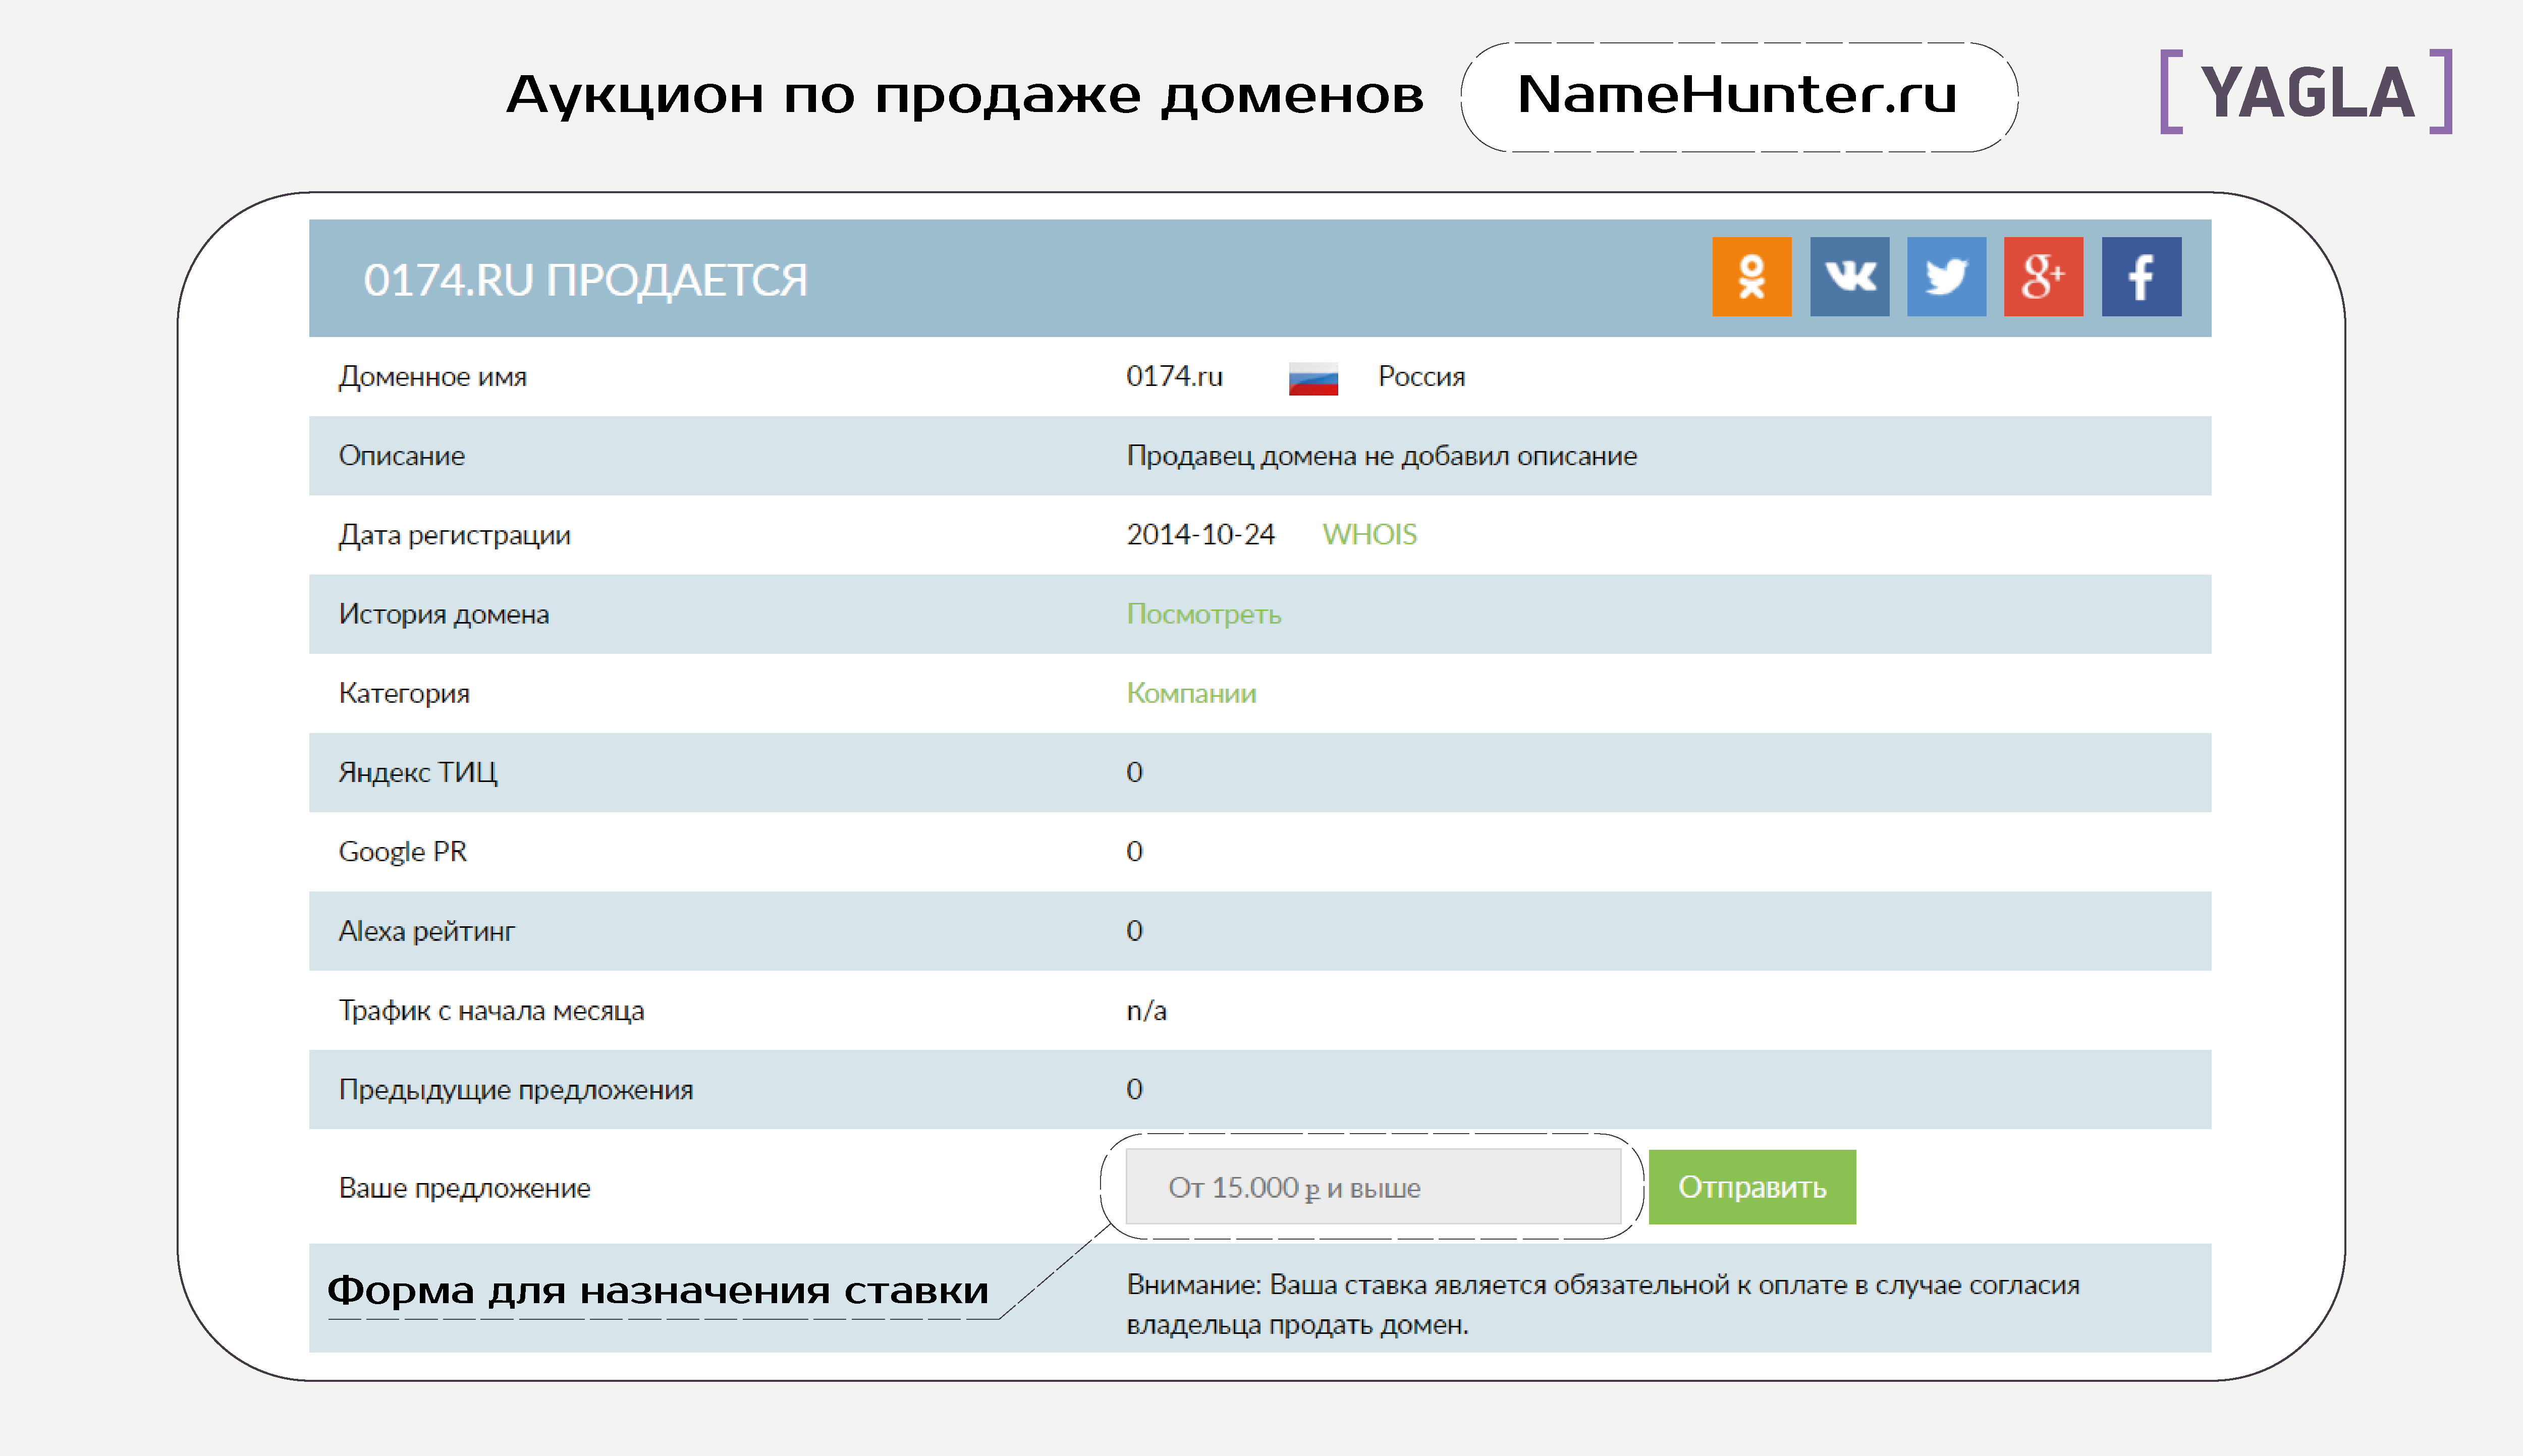 Аукцион по продаже доменов NameHunter.ru